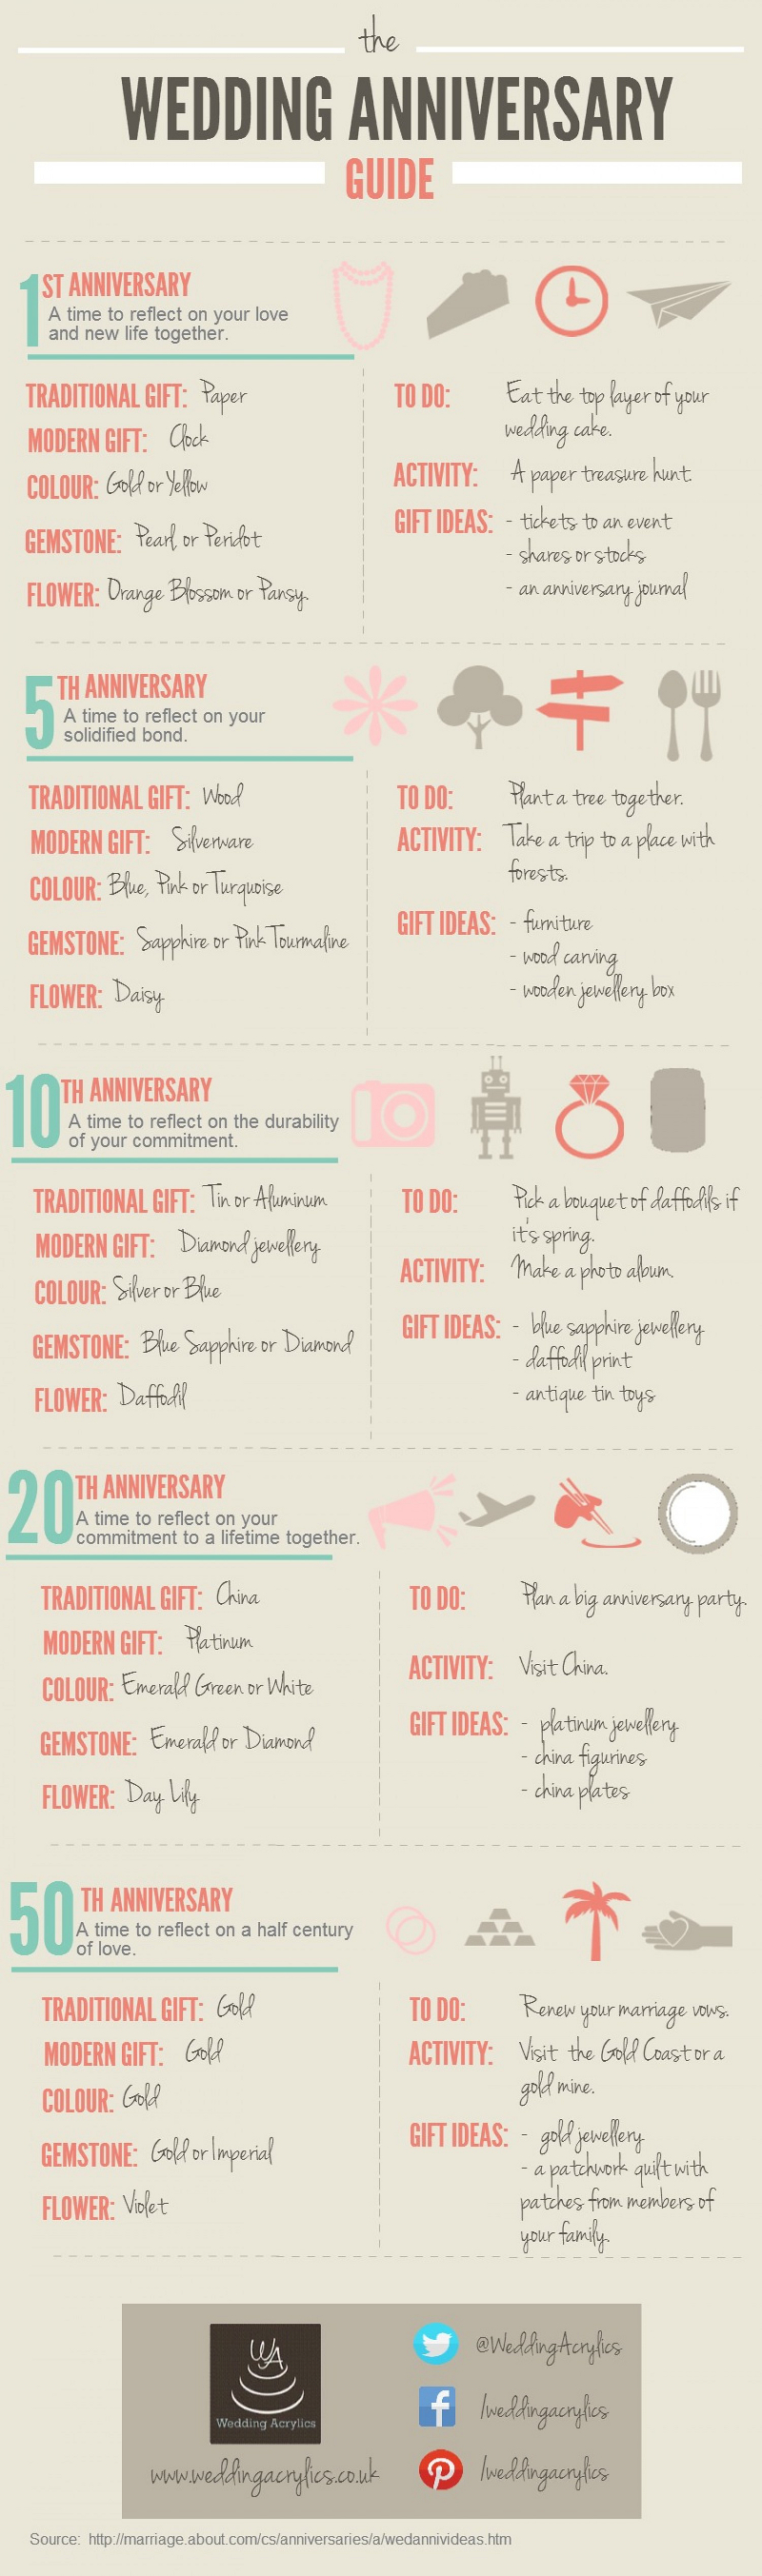 Wedding Anniversary Gift Guide : Wedding Anniversary Gifts: Wedding Anniversary Gift Guide